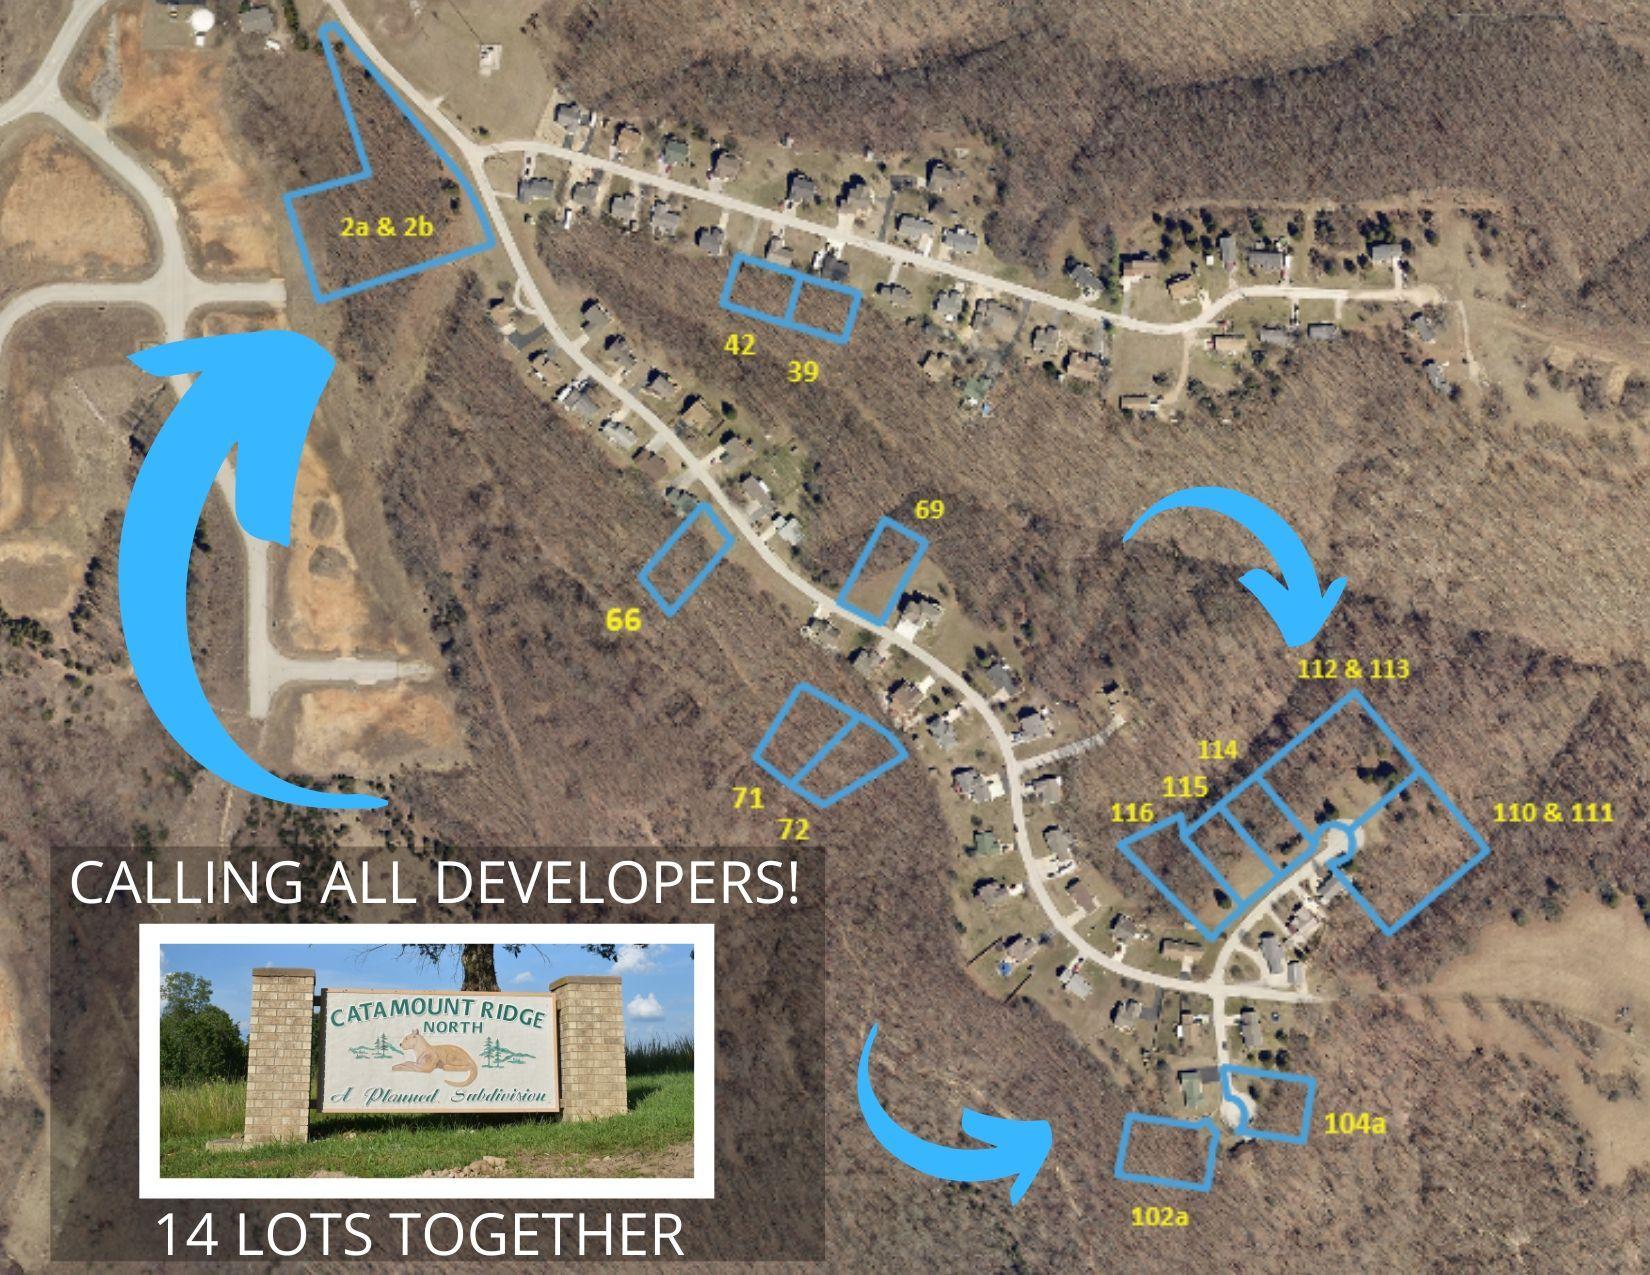 000 Lots Catamount Ridge North Branson West, MO 65737